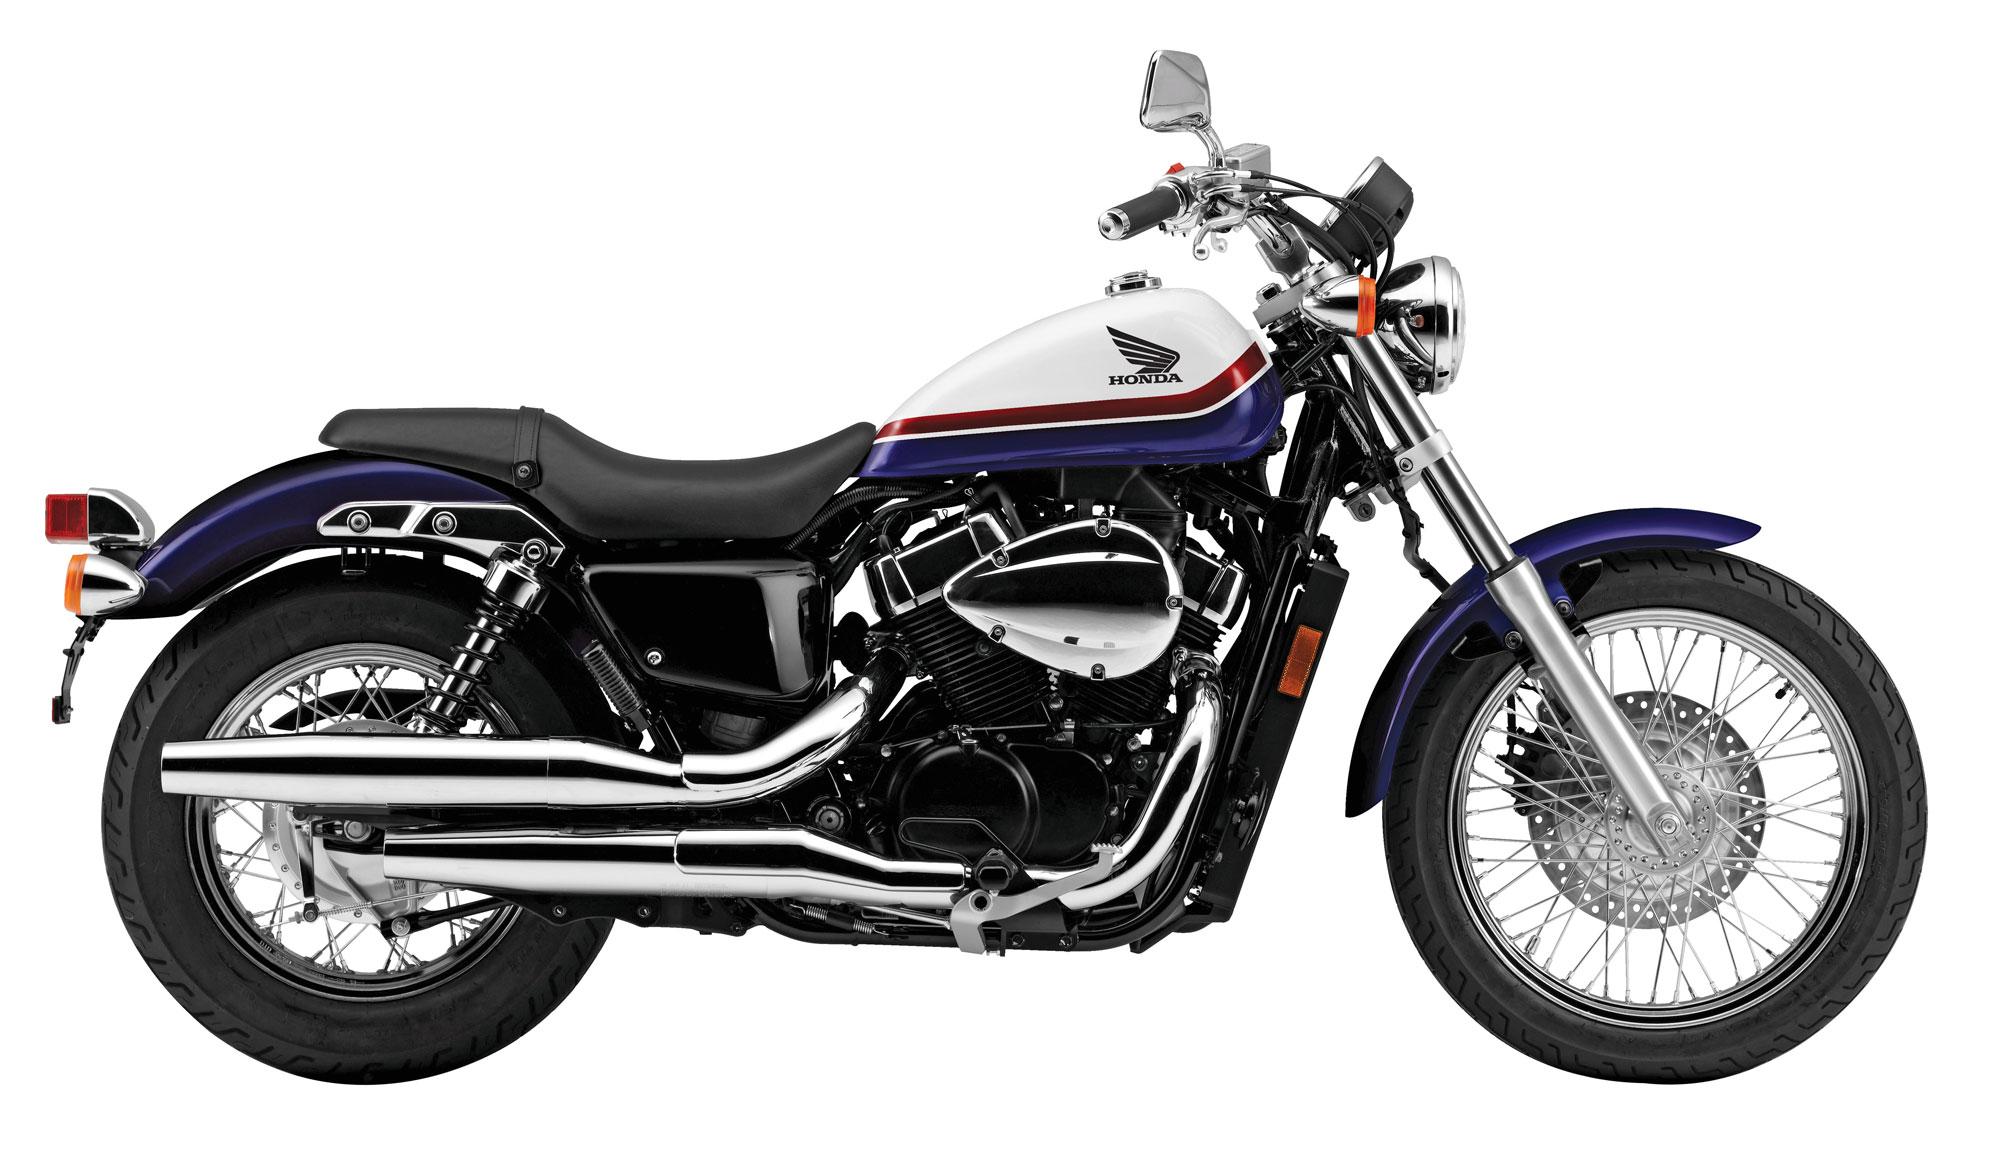 2011 Honda Motorcycle Models